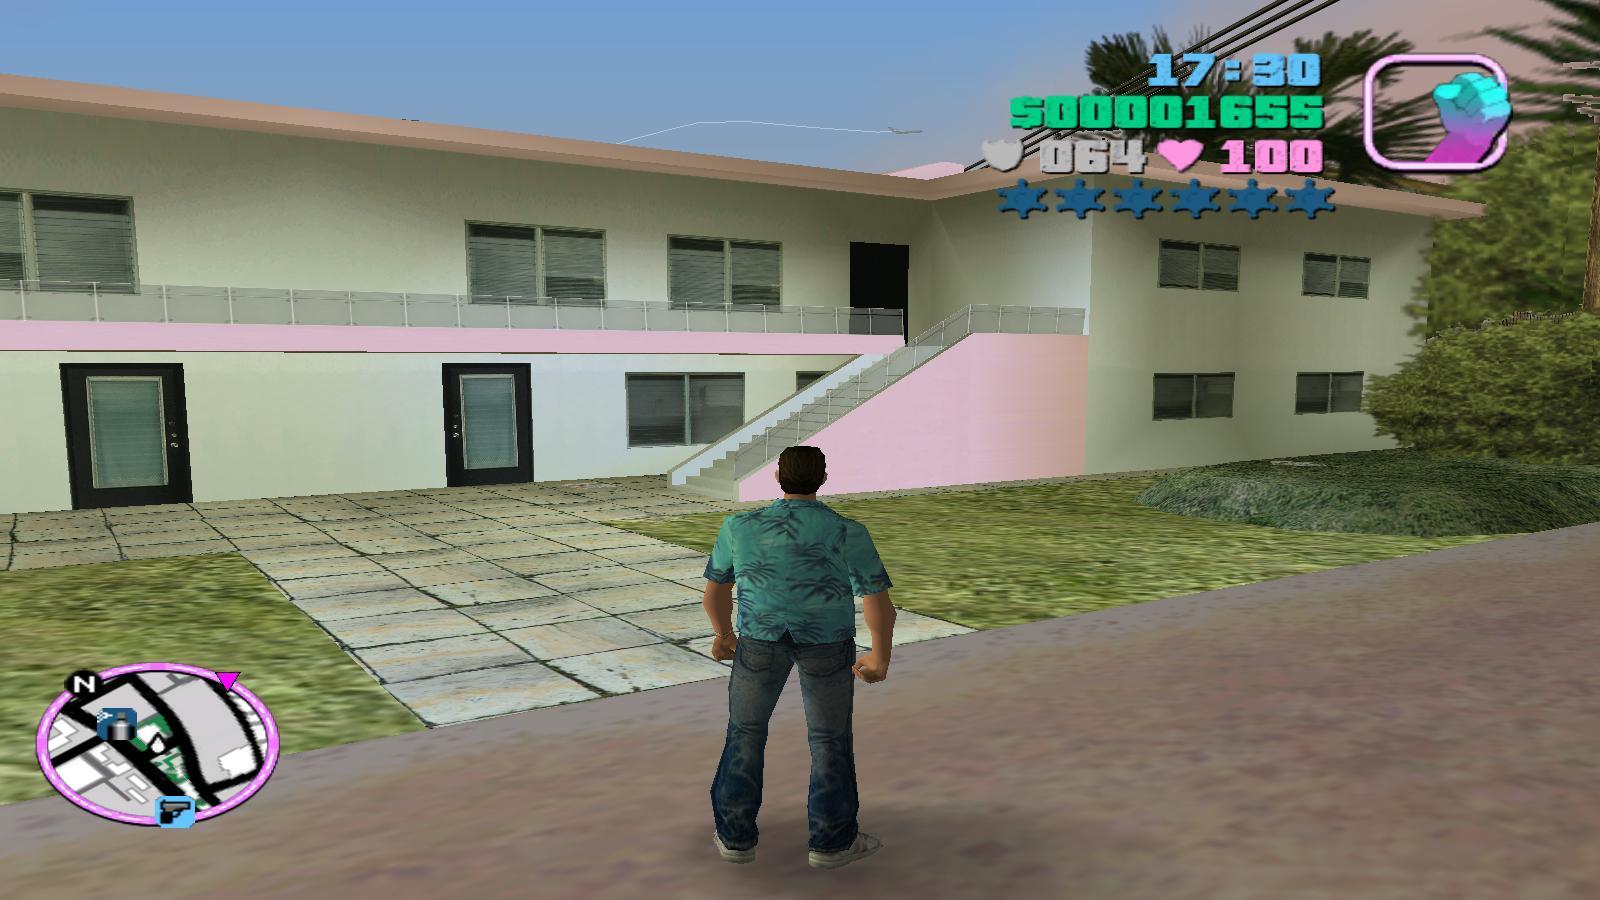 gta-vc 2011-08-05 16-17-27-01.jpg - Grand Theft Auto: Vice City